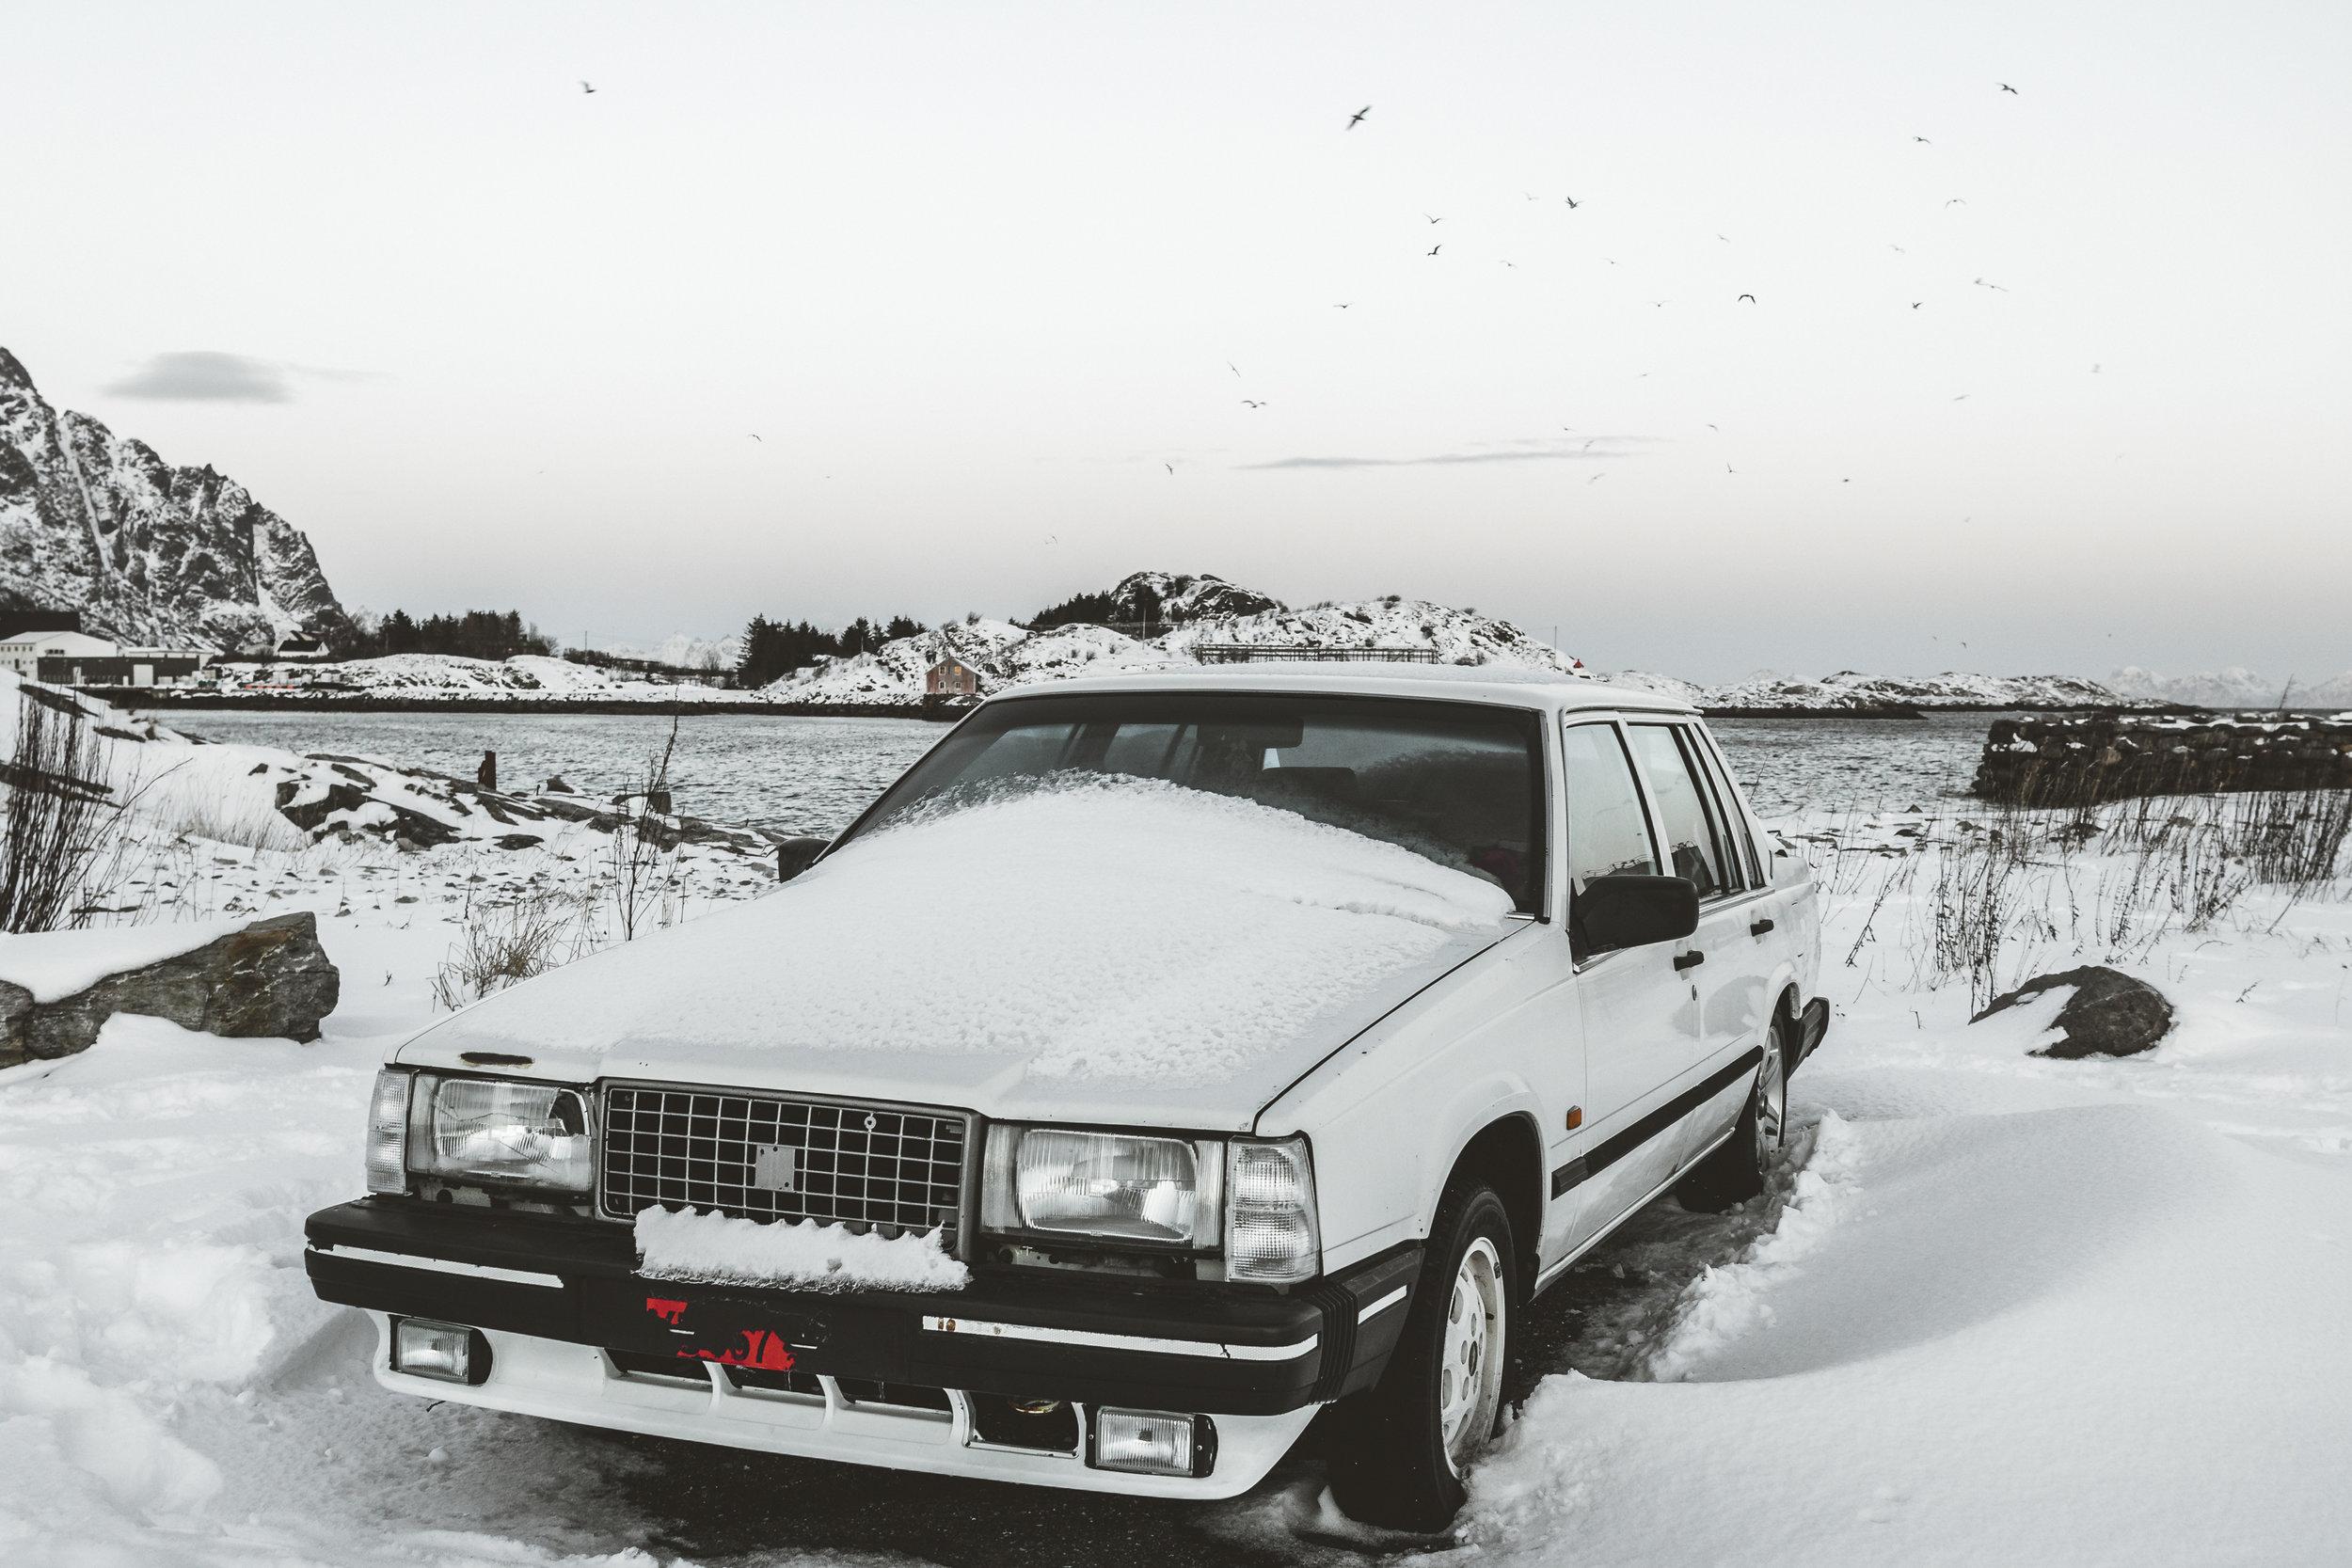 Snowy hood